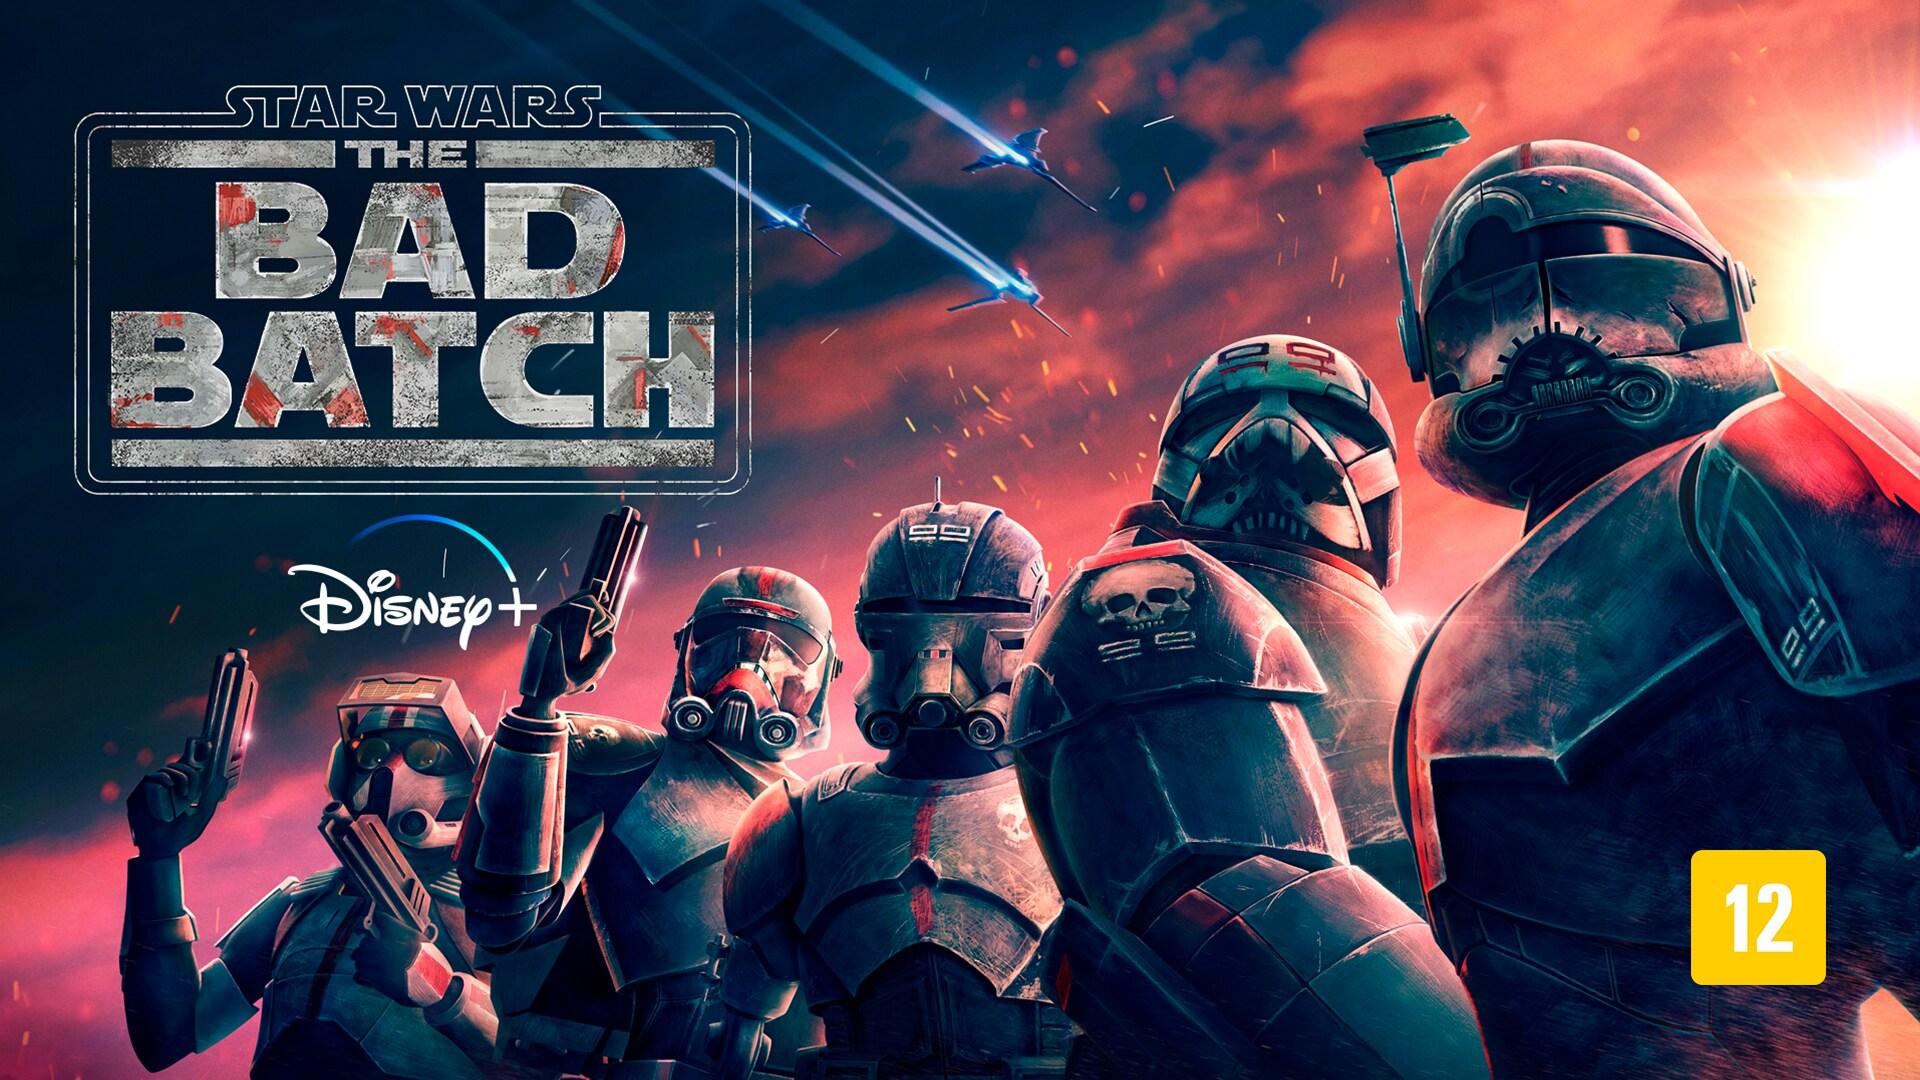 Star Wars: The Bad Batch | Disponível no Disney+